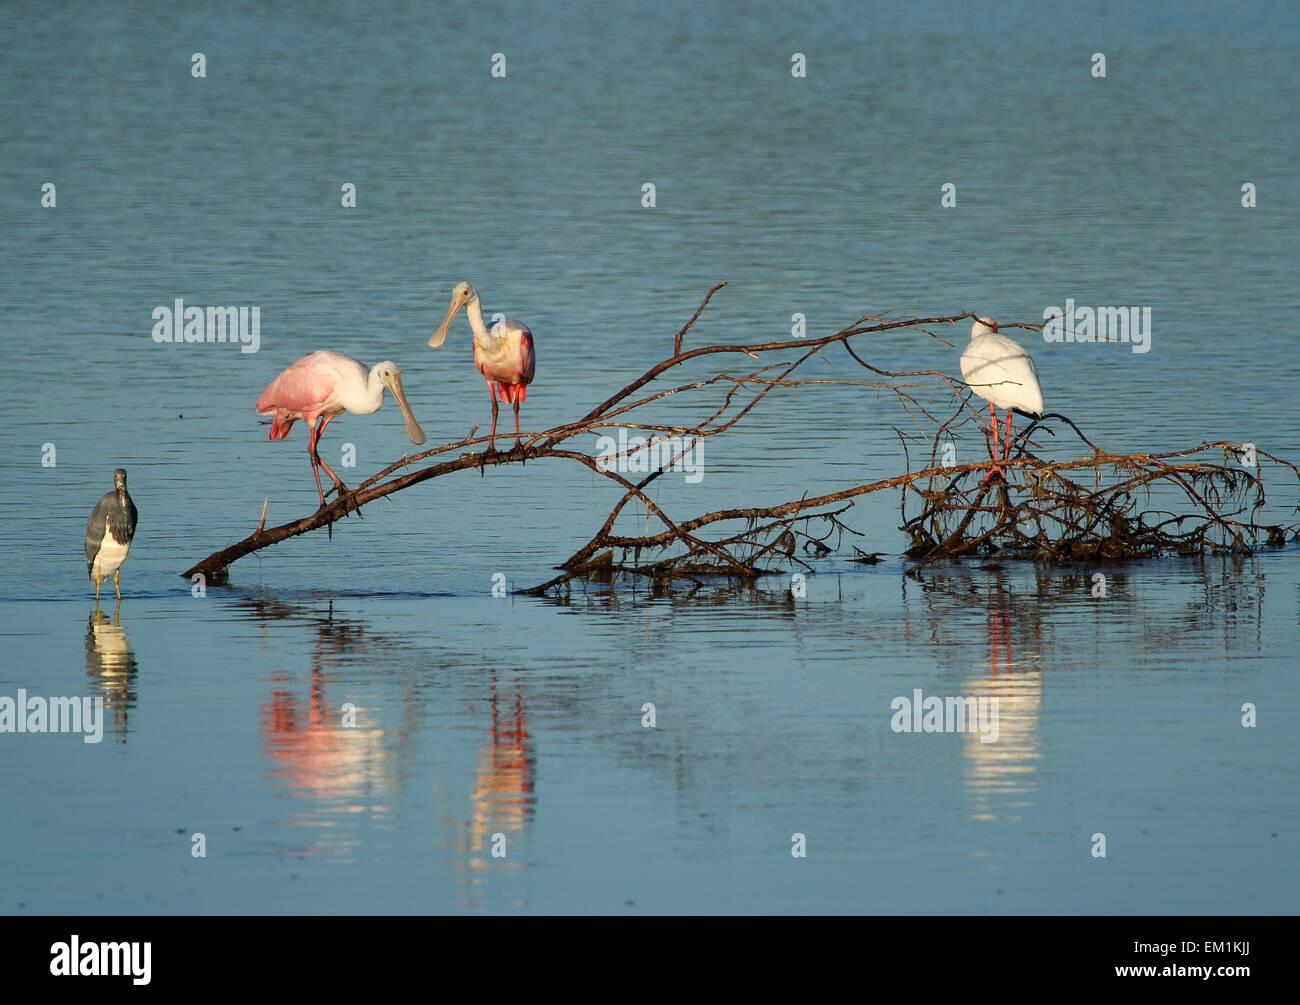 Roseate Spoonbills at Ding Darling National Wildlife Refuge - Stock Image